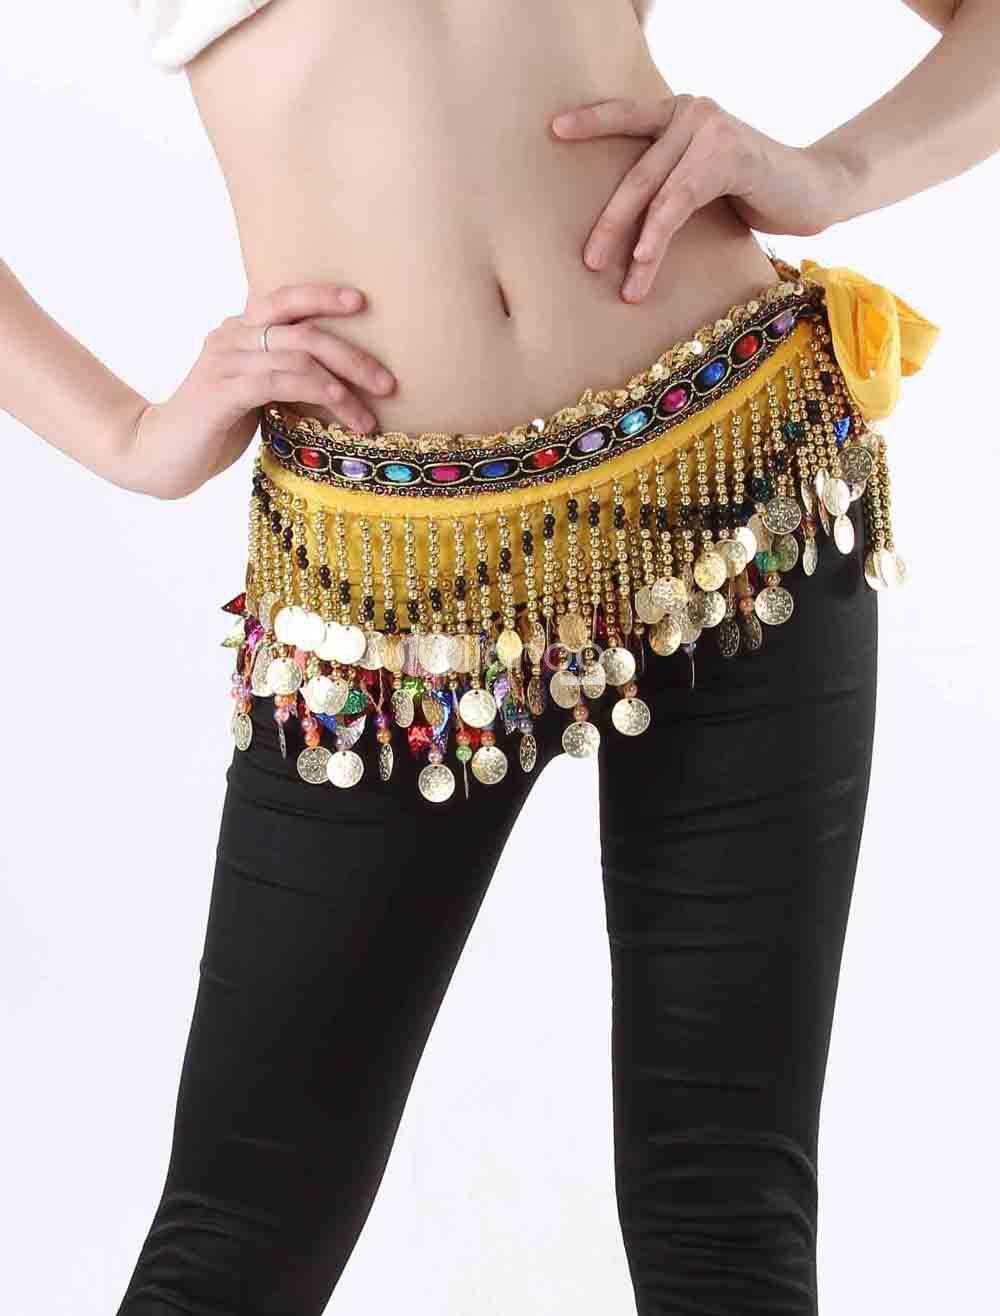 Belly Dance Waist Chain And Hip Scarf 17 She12 Girls